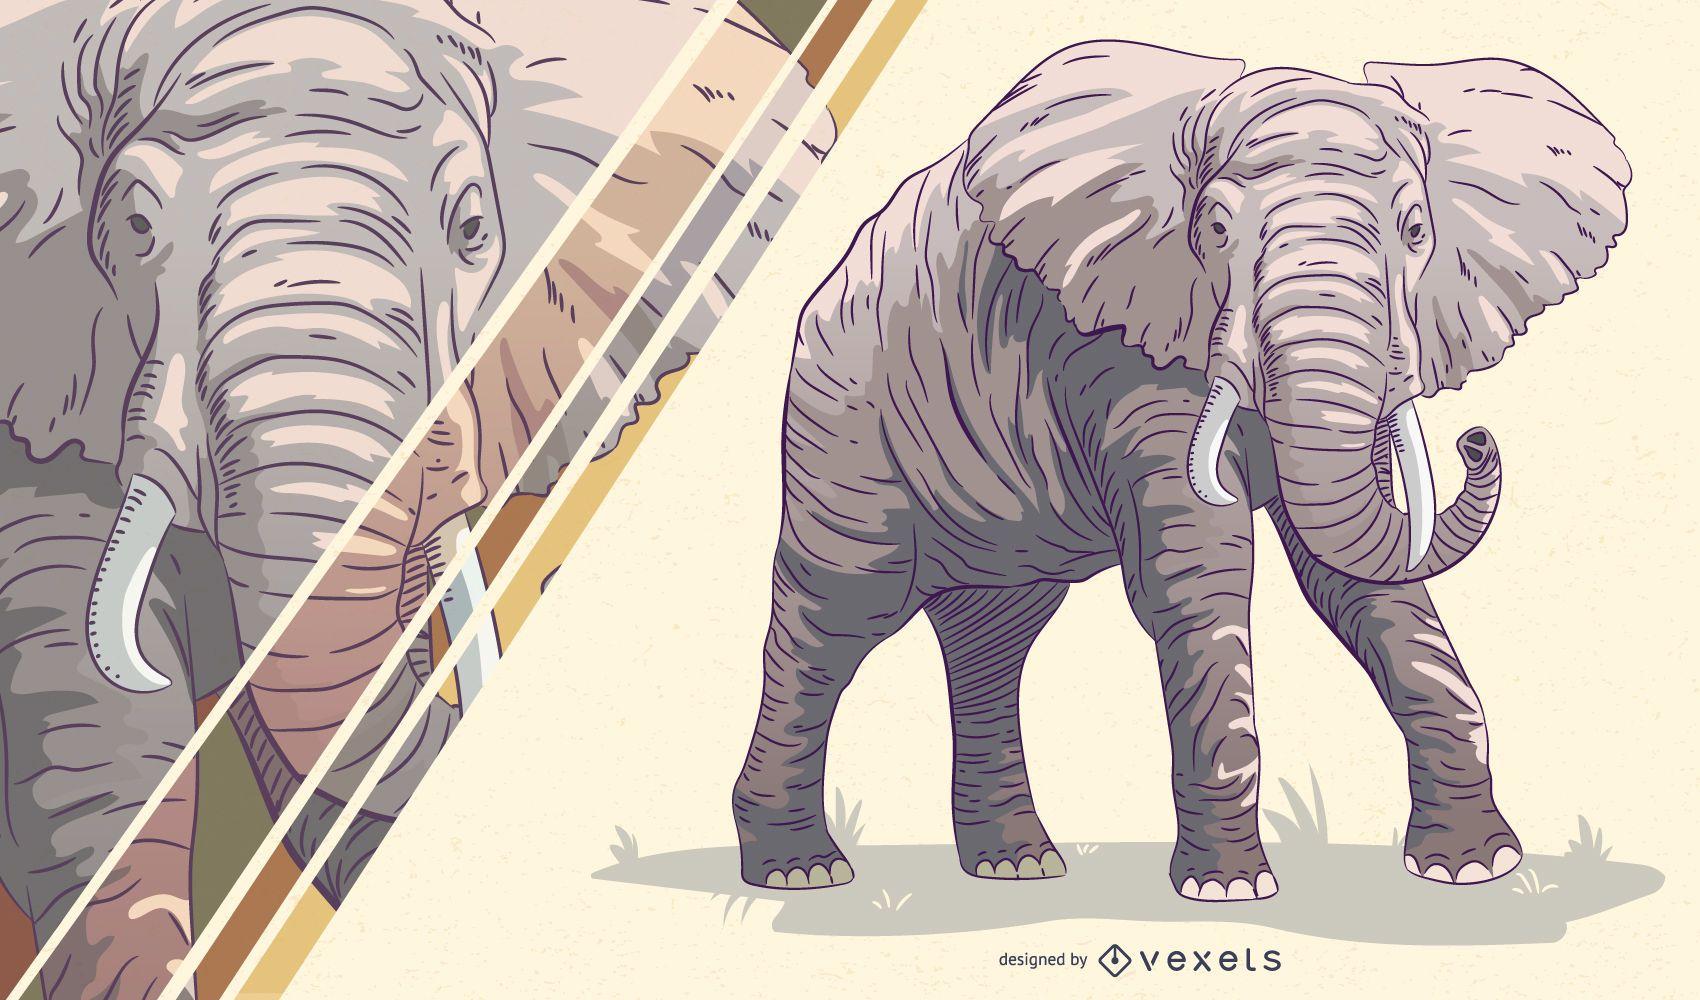 Elephant artistic illustration